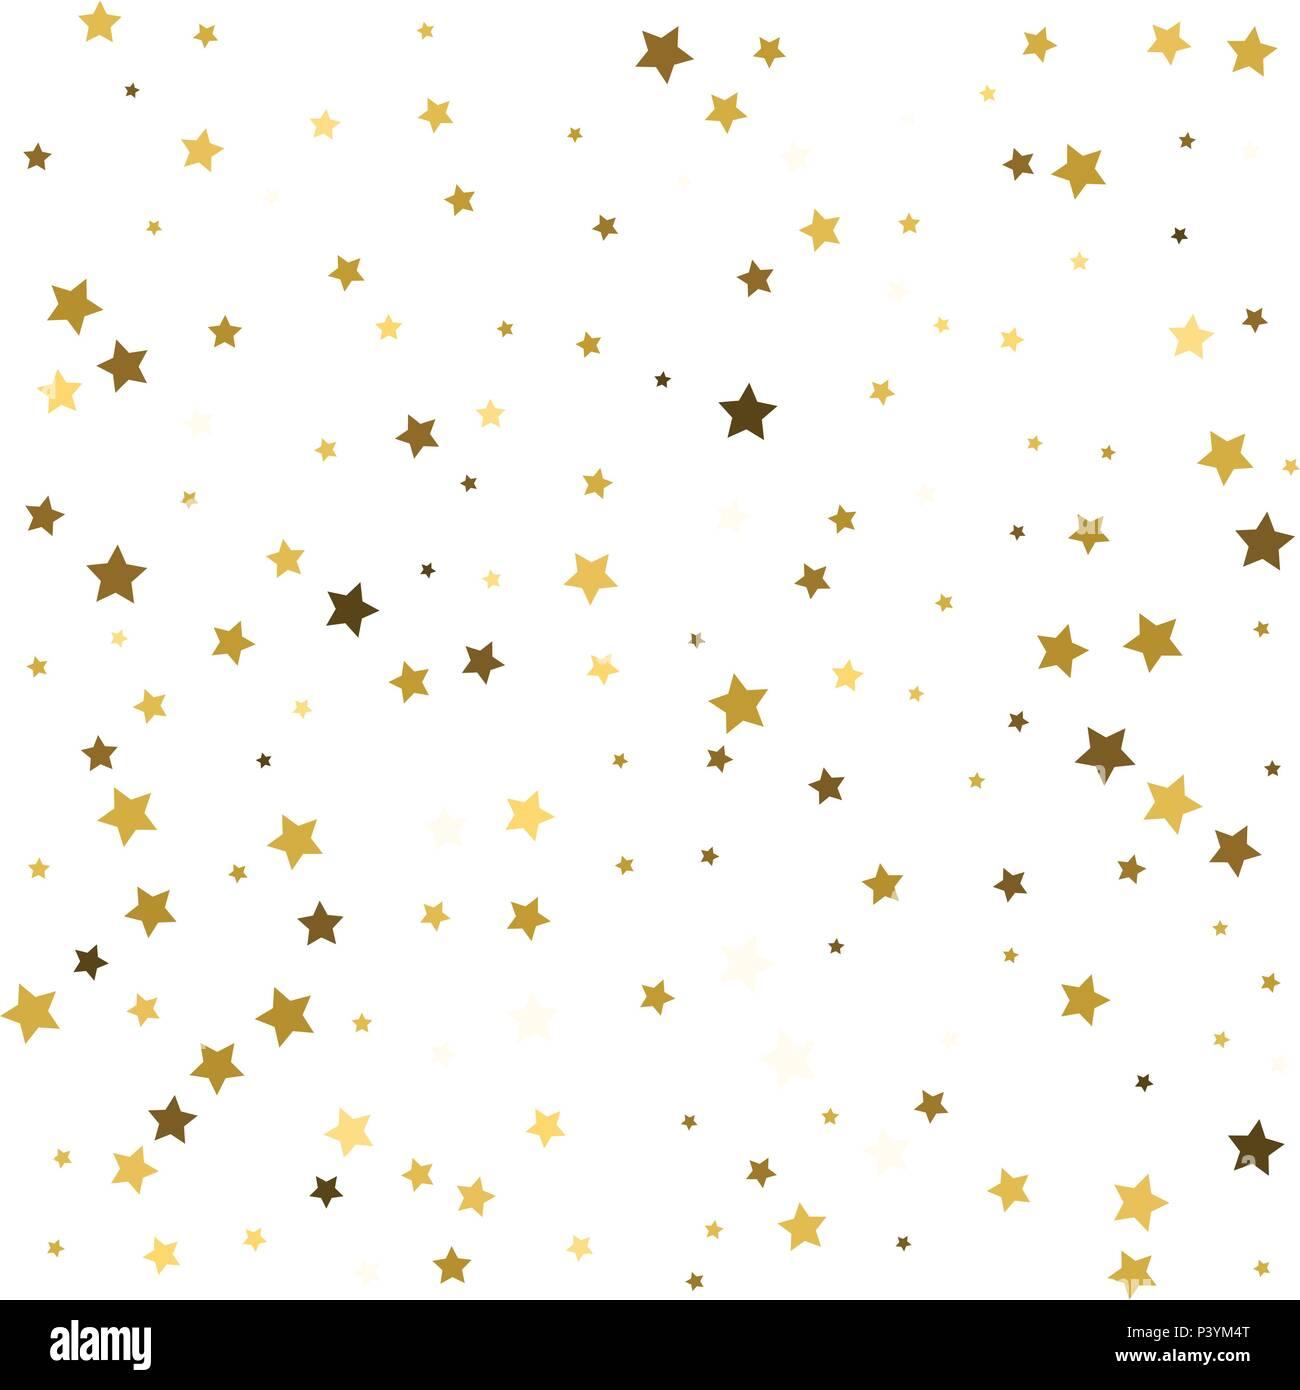 Patrón abstracto de azar caer estrellas doradas sobre fondo blanco ...